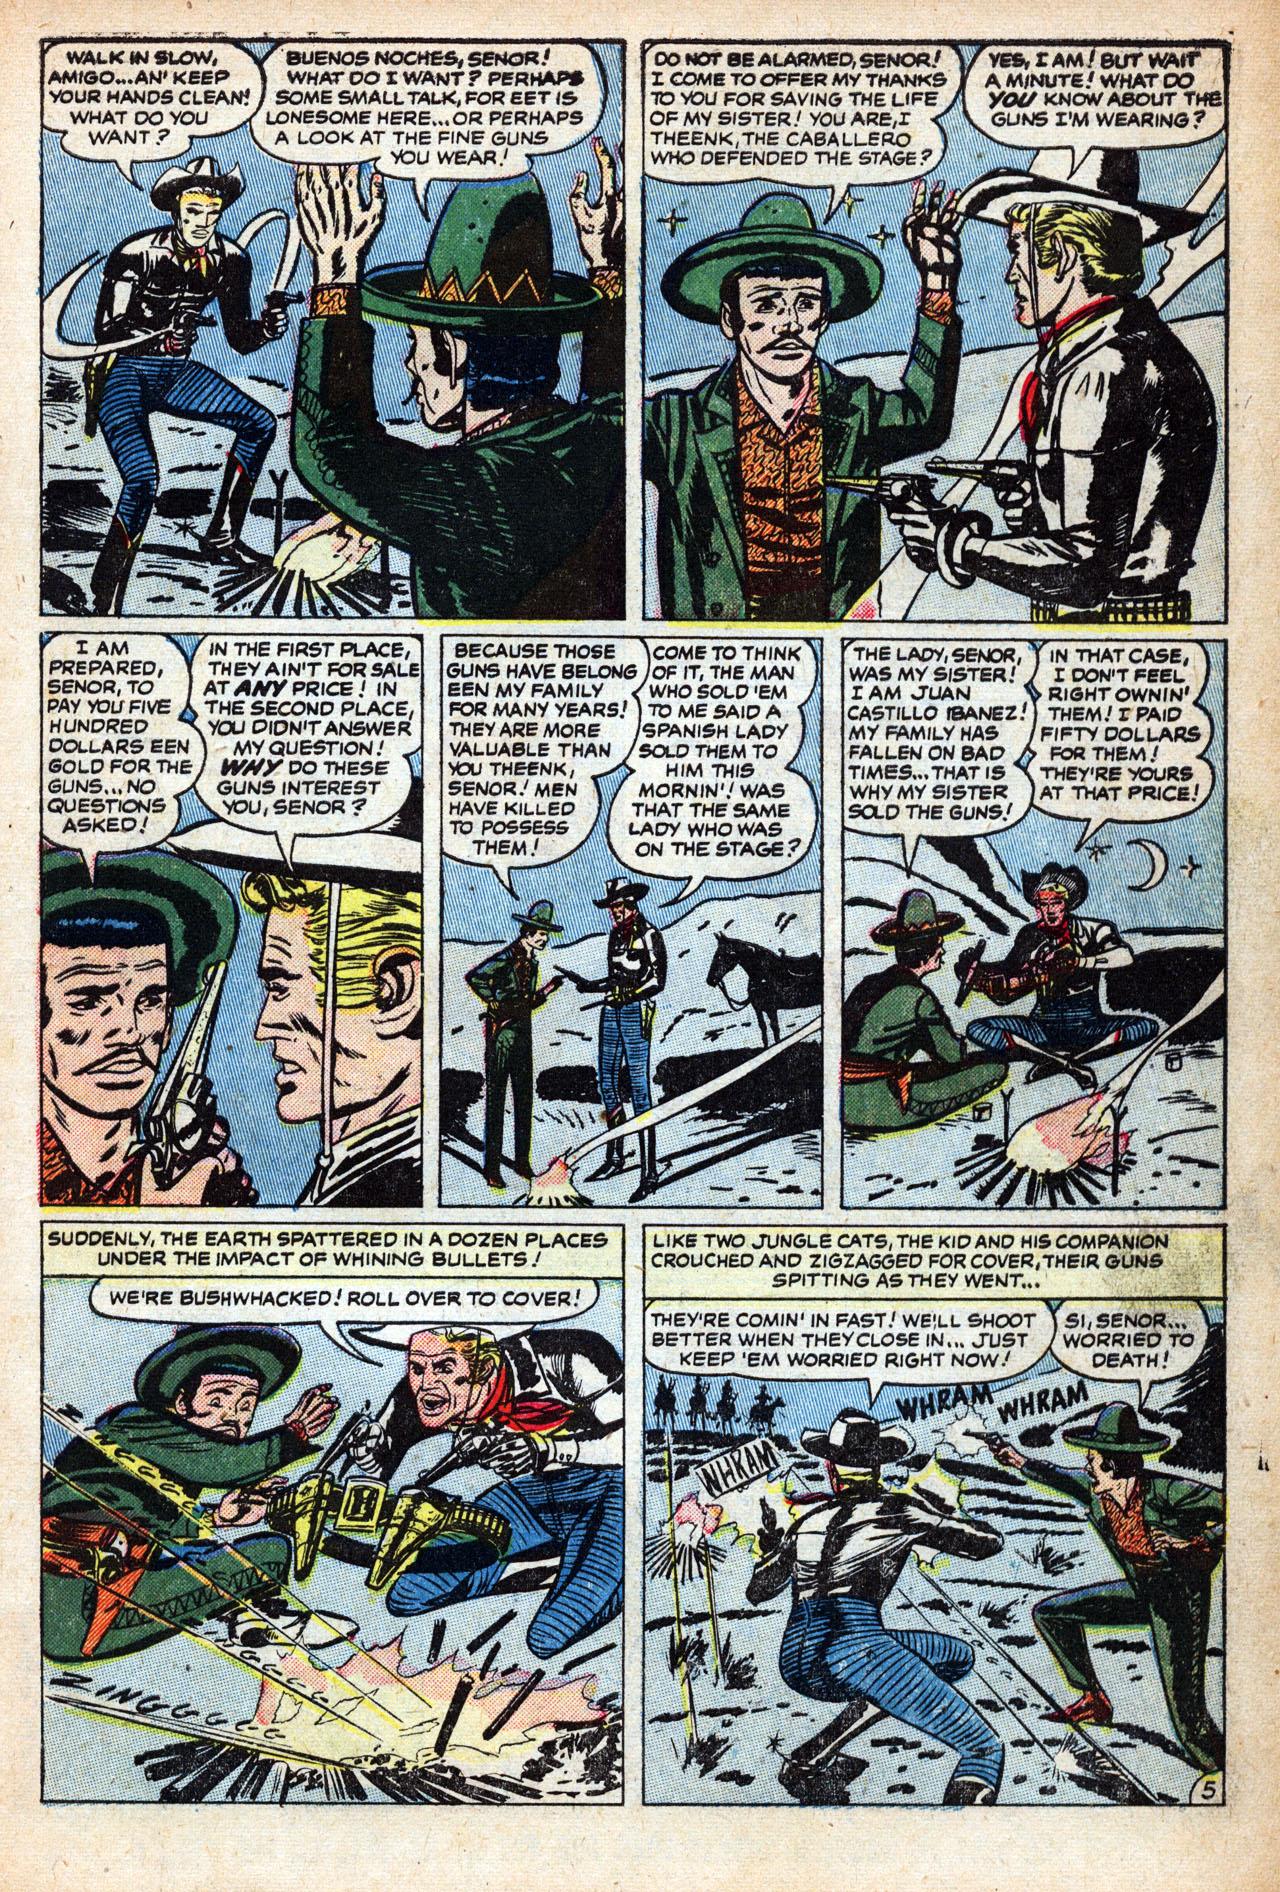 Read online Two-Gun Kid comic -  Issue #15 - 7